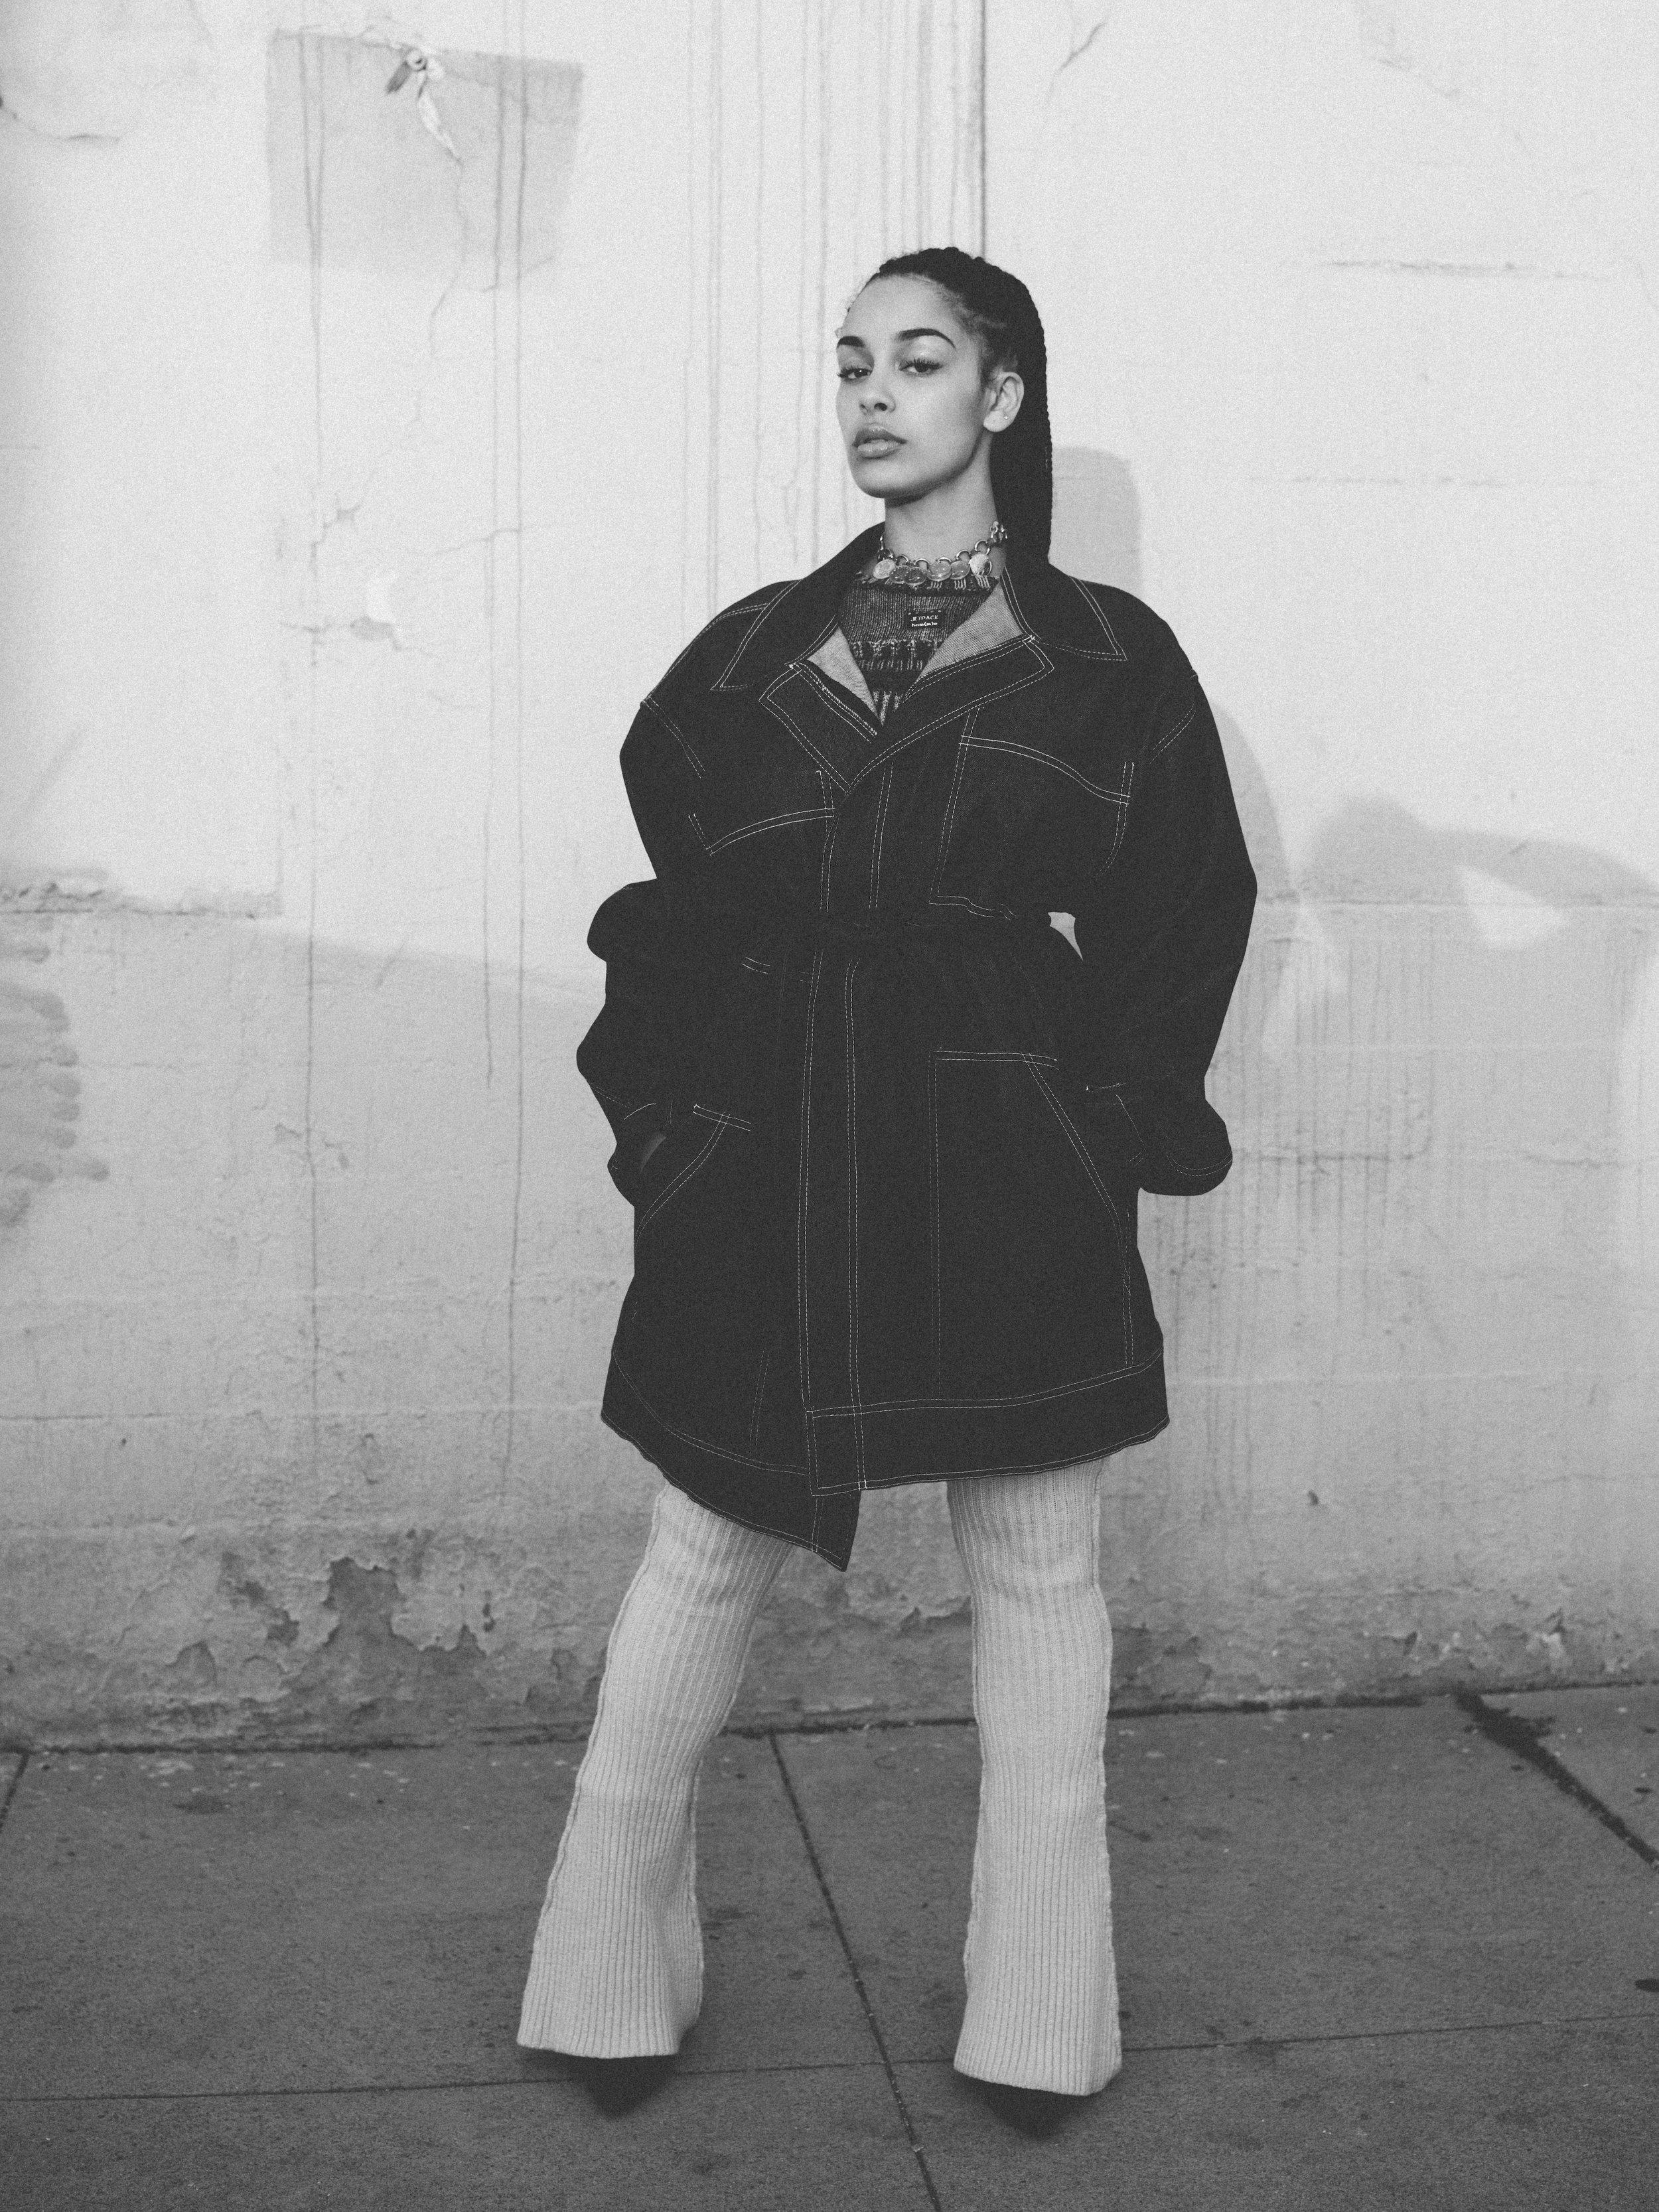 LA ROXX jacket,KNORTS top and pants,UNRAVEL shoes,HARDWARE LDNbelt, and Vintage necklace available at Squaresville, LA.